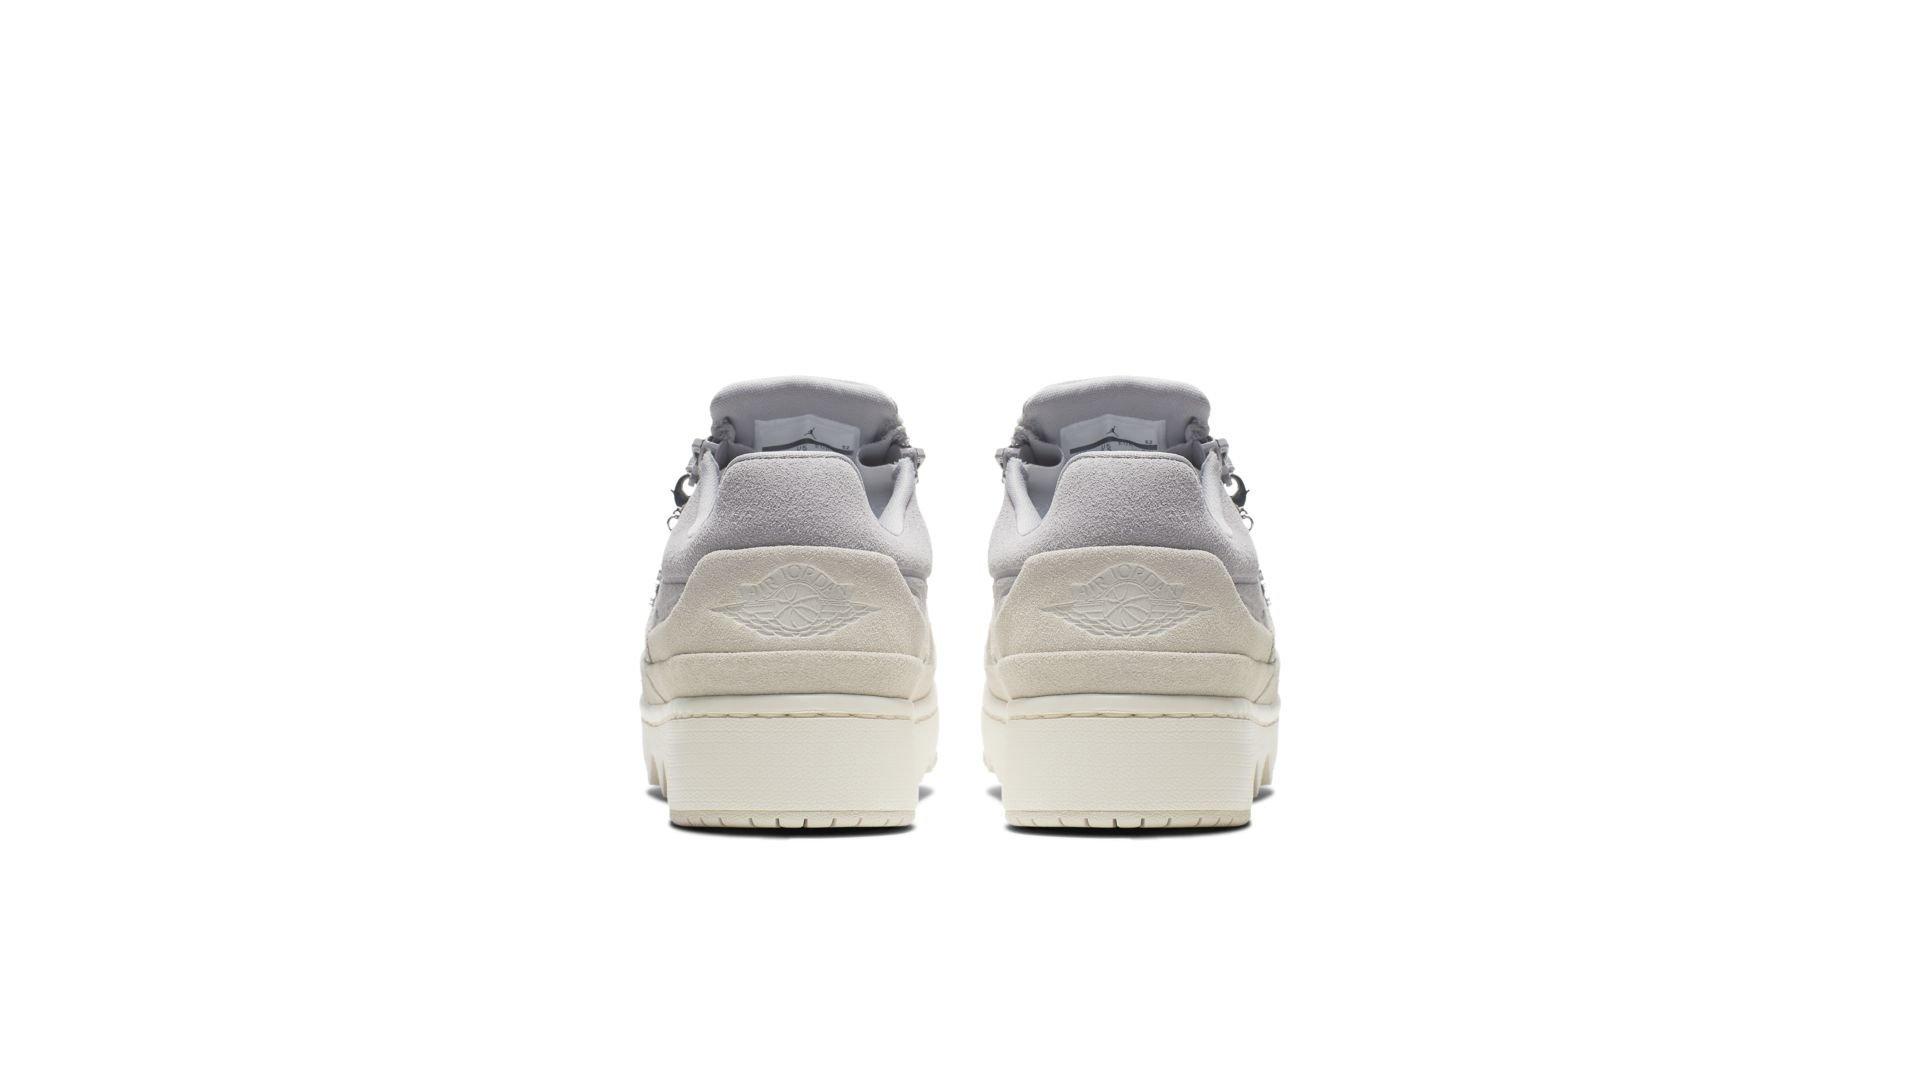 Jordan 1 Jester XX Low Atmosphere Grey (W) (AV4050-002)